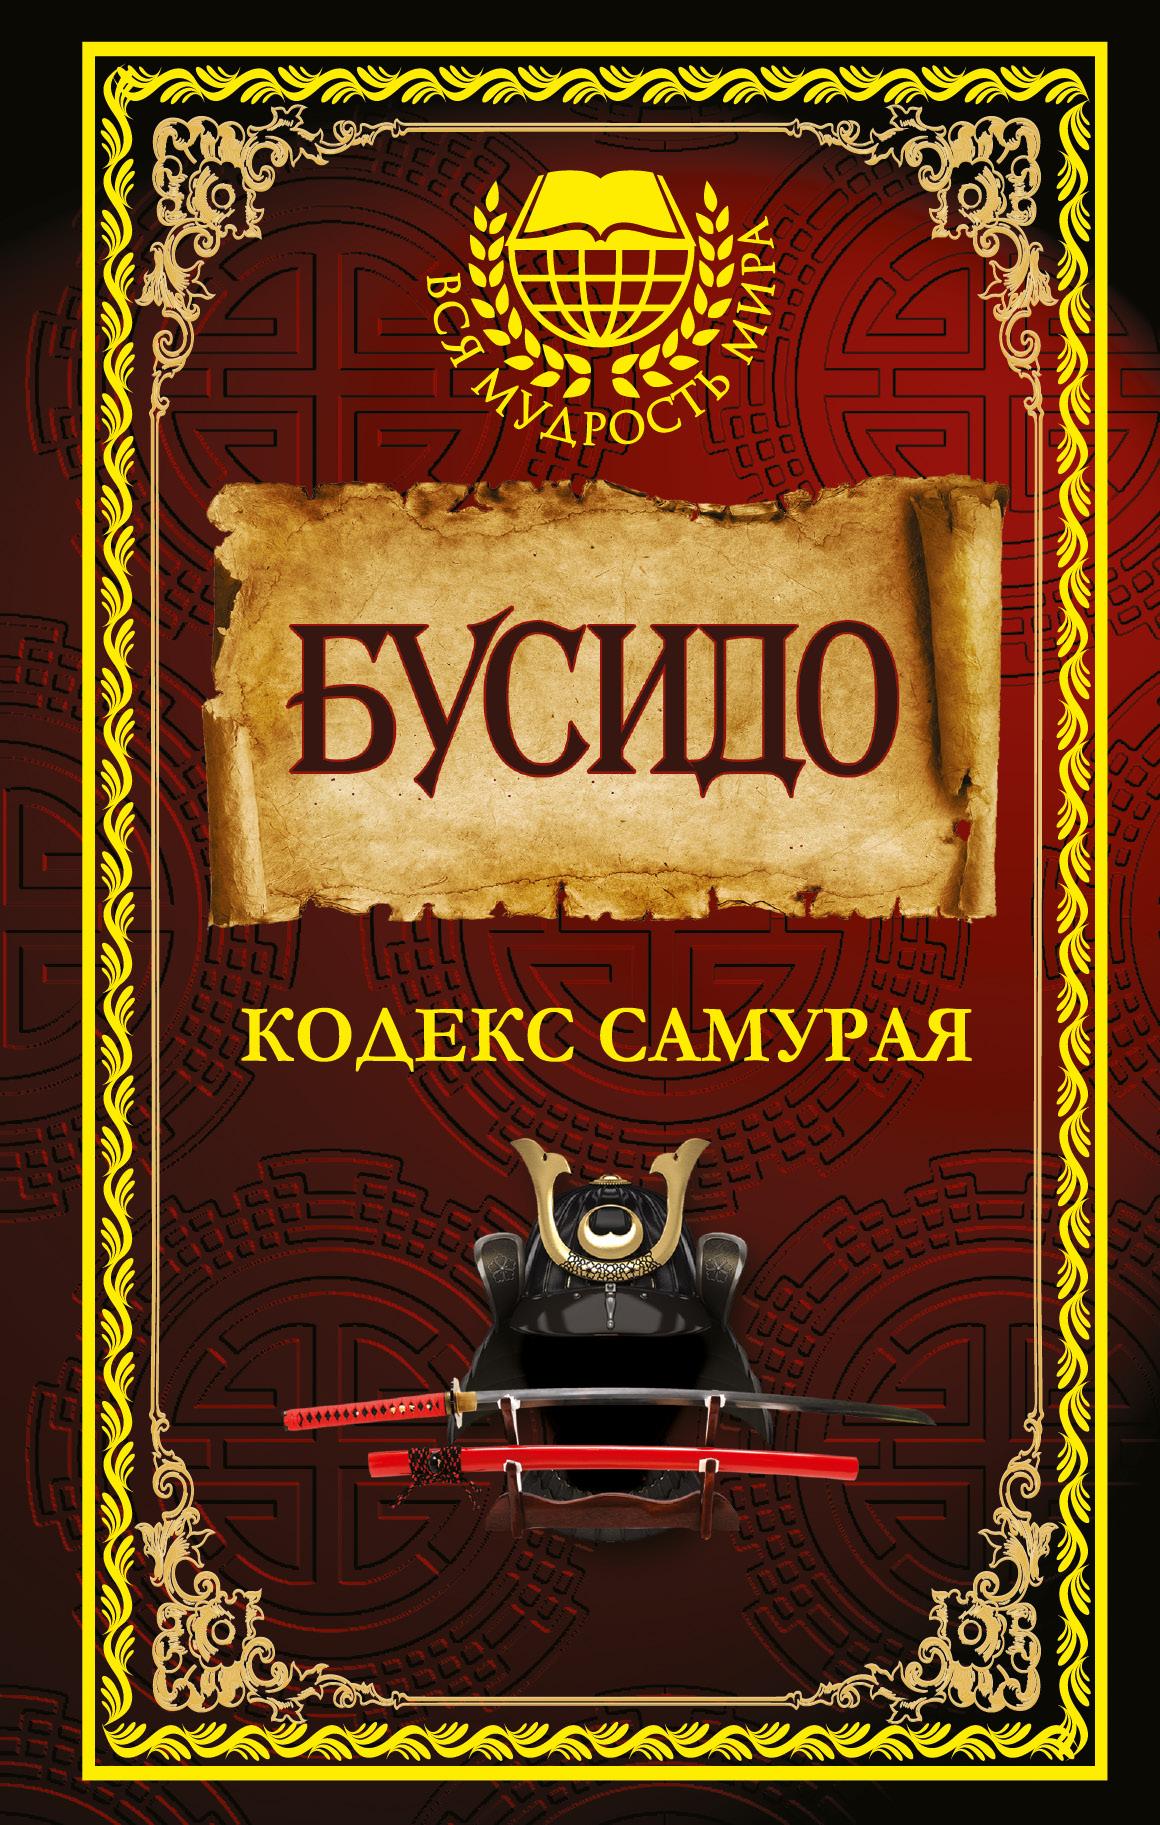 Ямамото Цунэтомо Бусидо. Кодекс самурая (сборник) дайдодзи ю цунэтомо я мусаси м и др бусидо военный канон самурая с комментариями